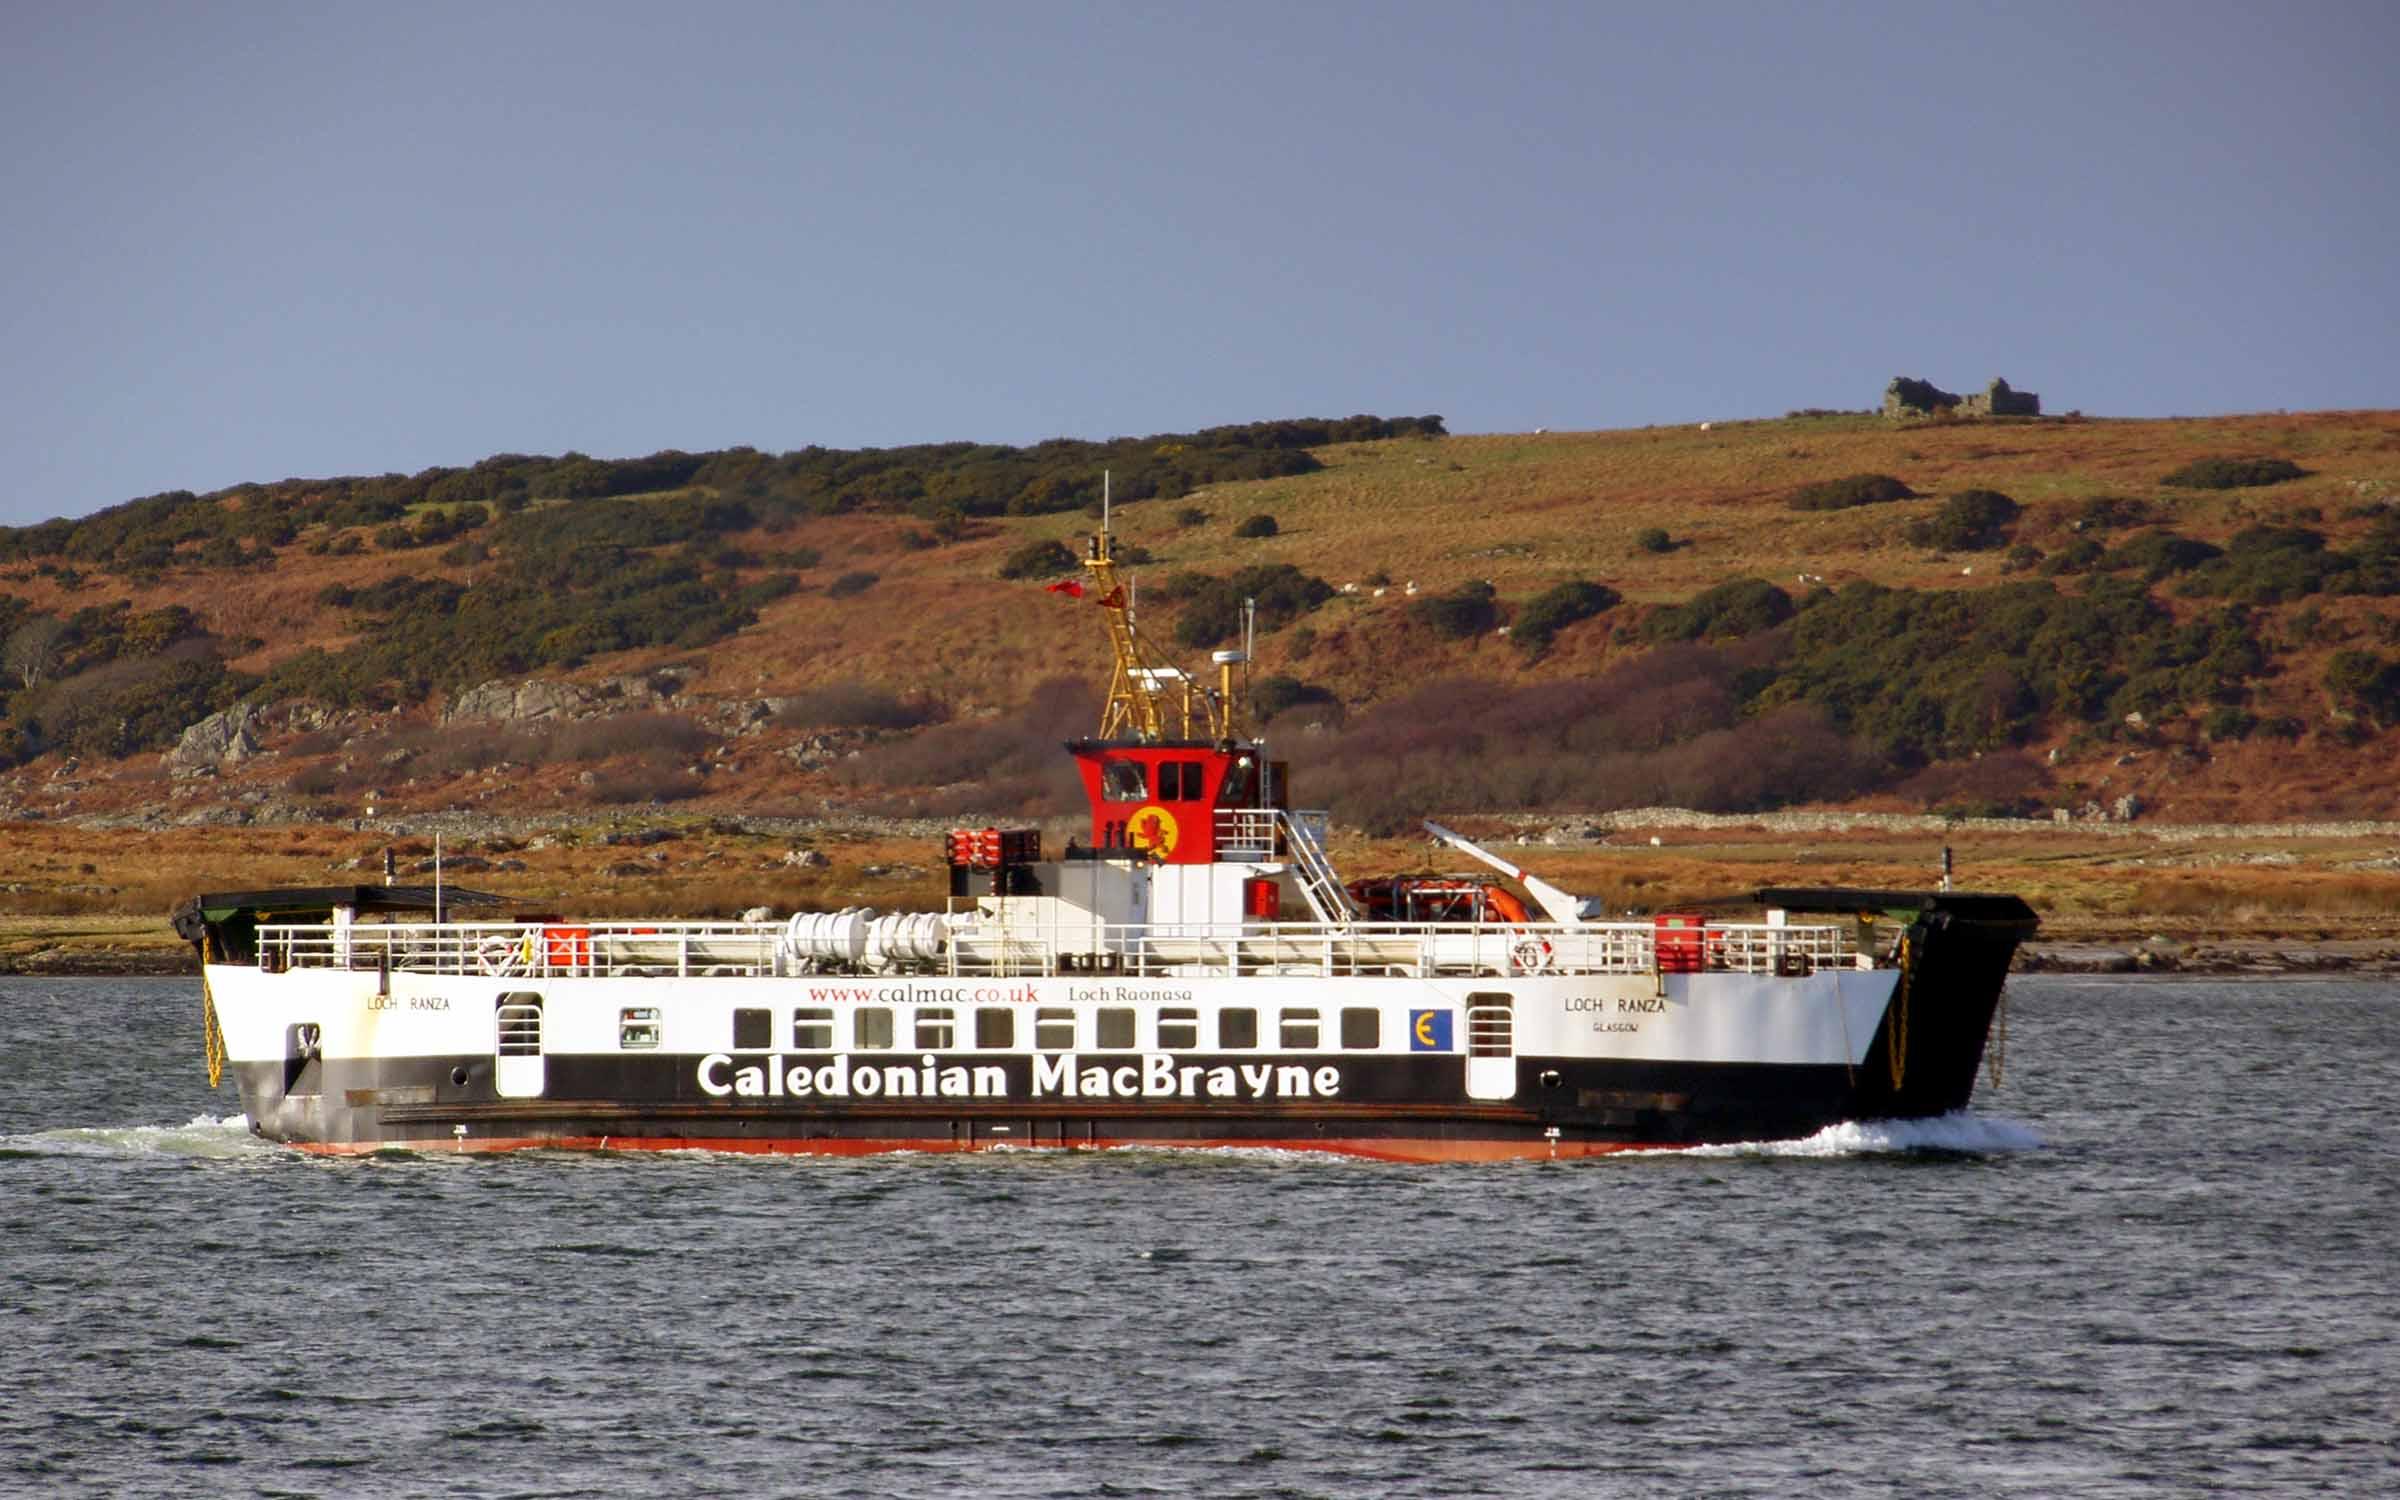 Loch Ranza in West Loch Tarbert (Ships of CalMac)